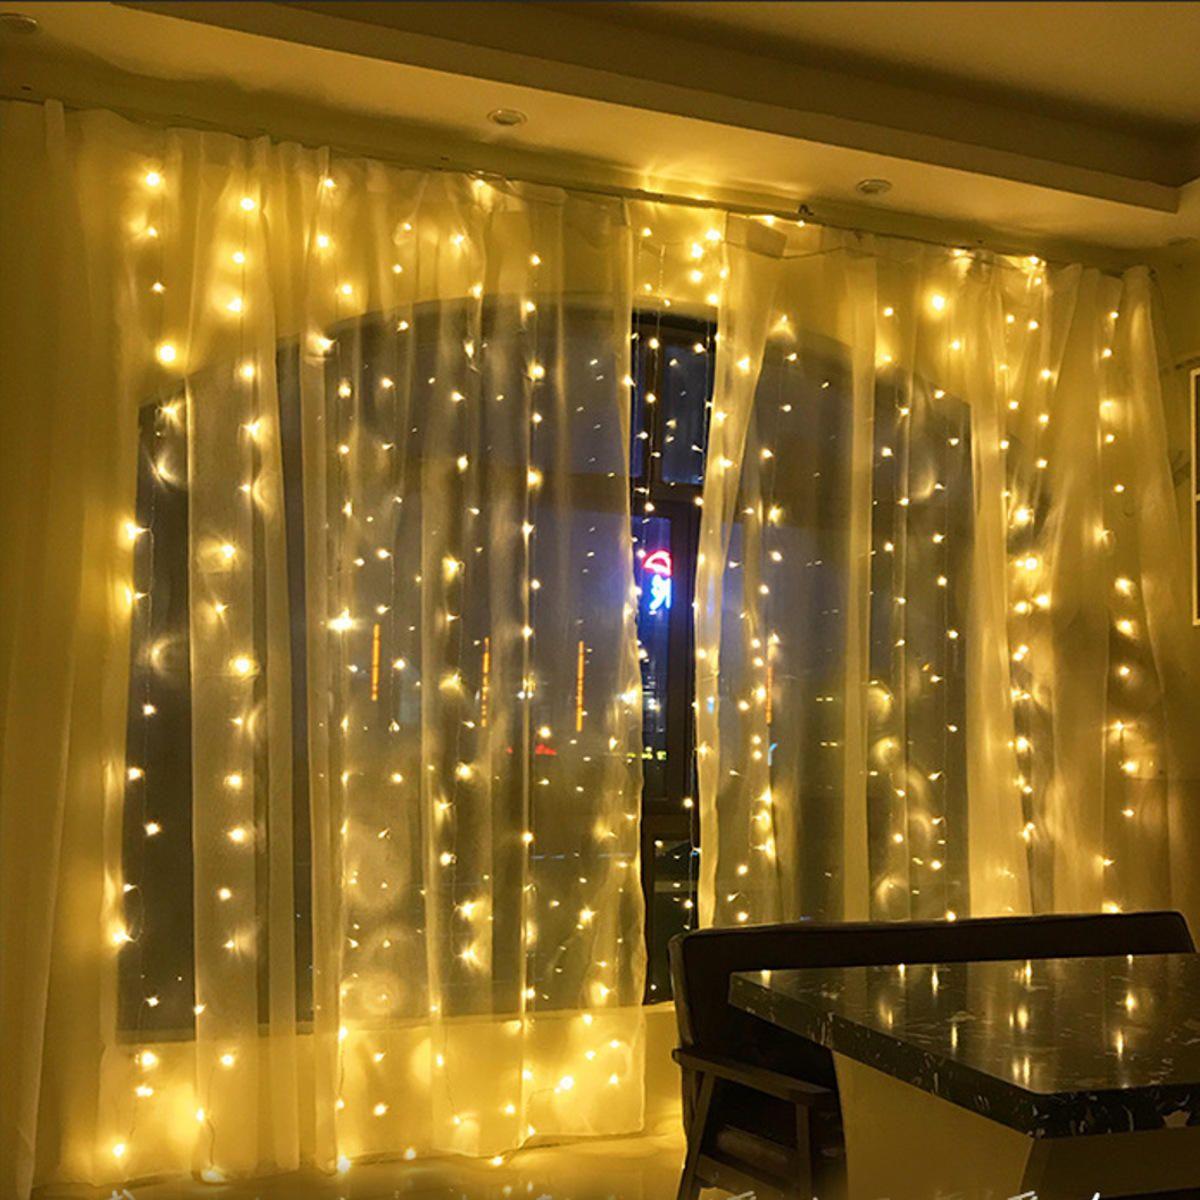 OJF US$27.96 6Mx3M AC220V EU Plug LED Curtain String Light Organza Backdrop for Weddings Birthday Party Events Display